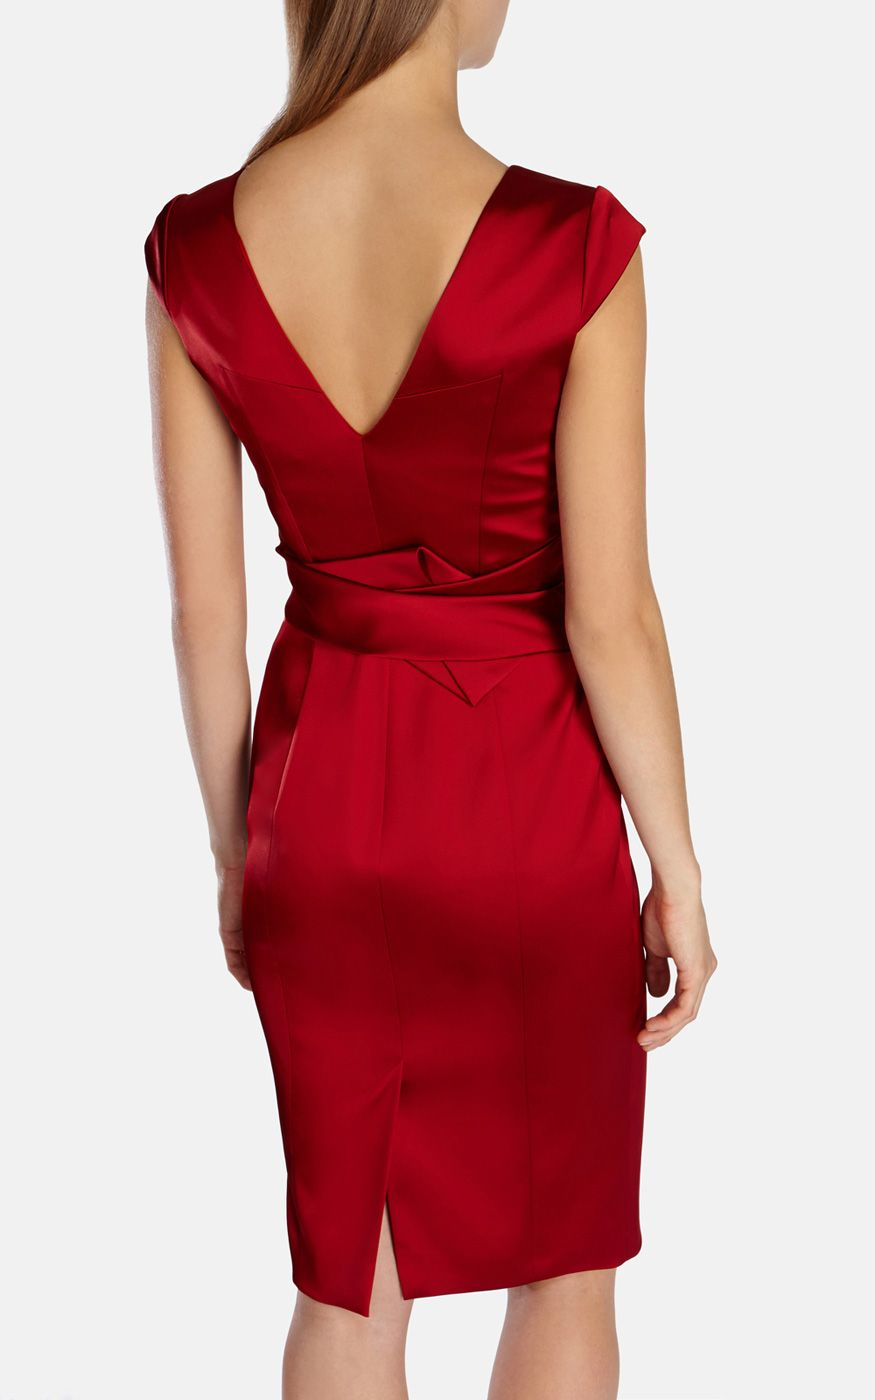 Karen millen red signature satin dress in red lyst